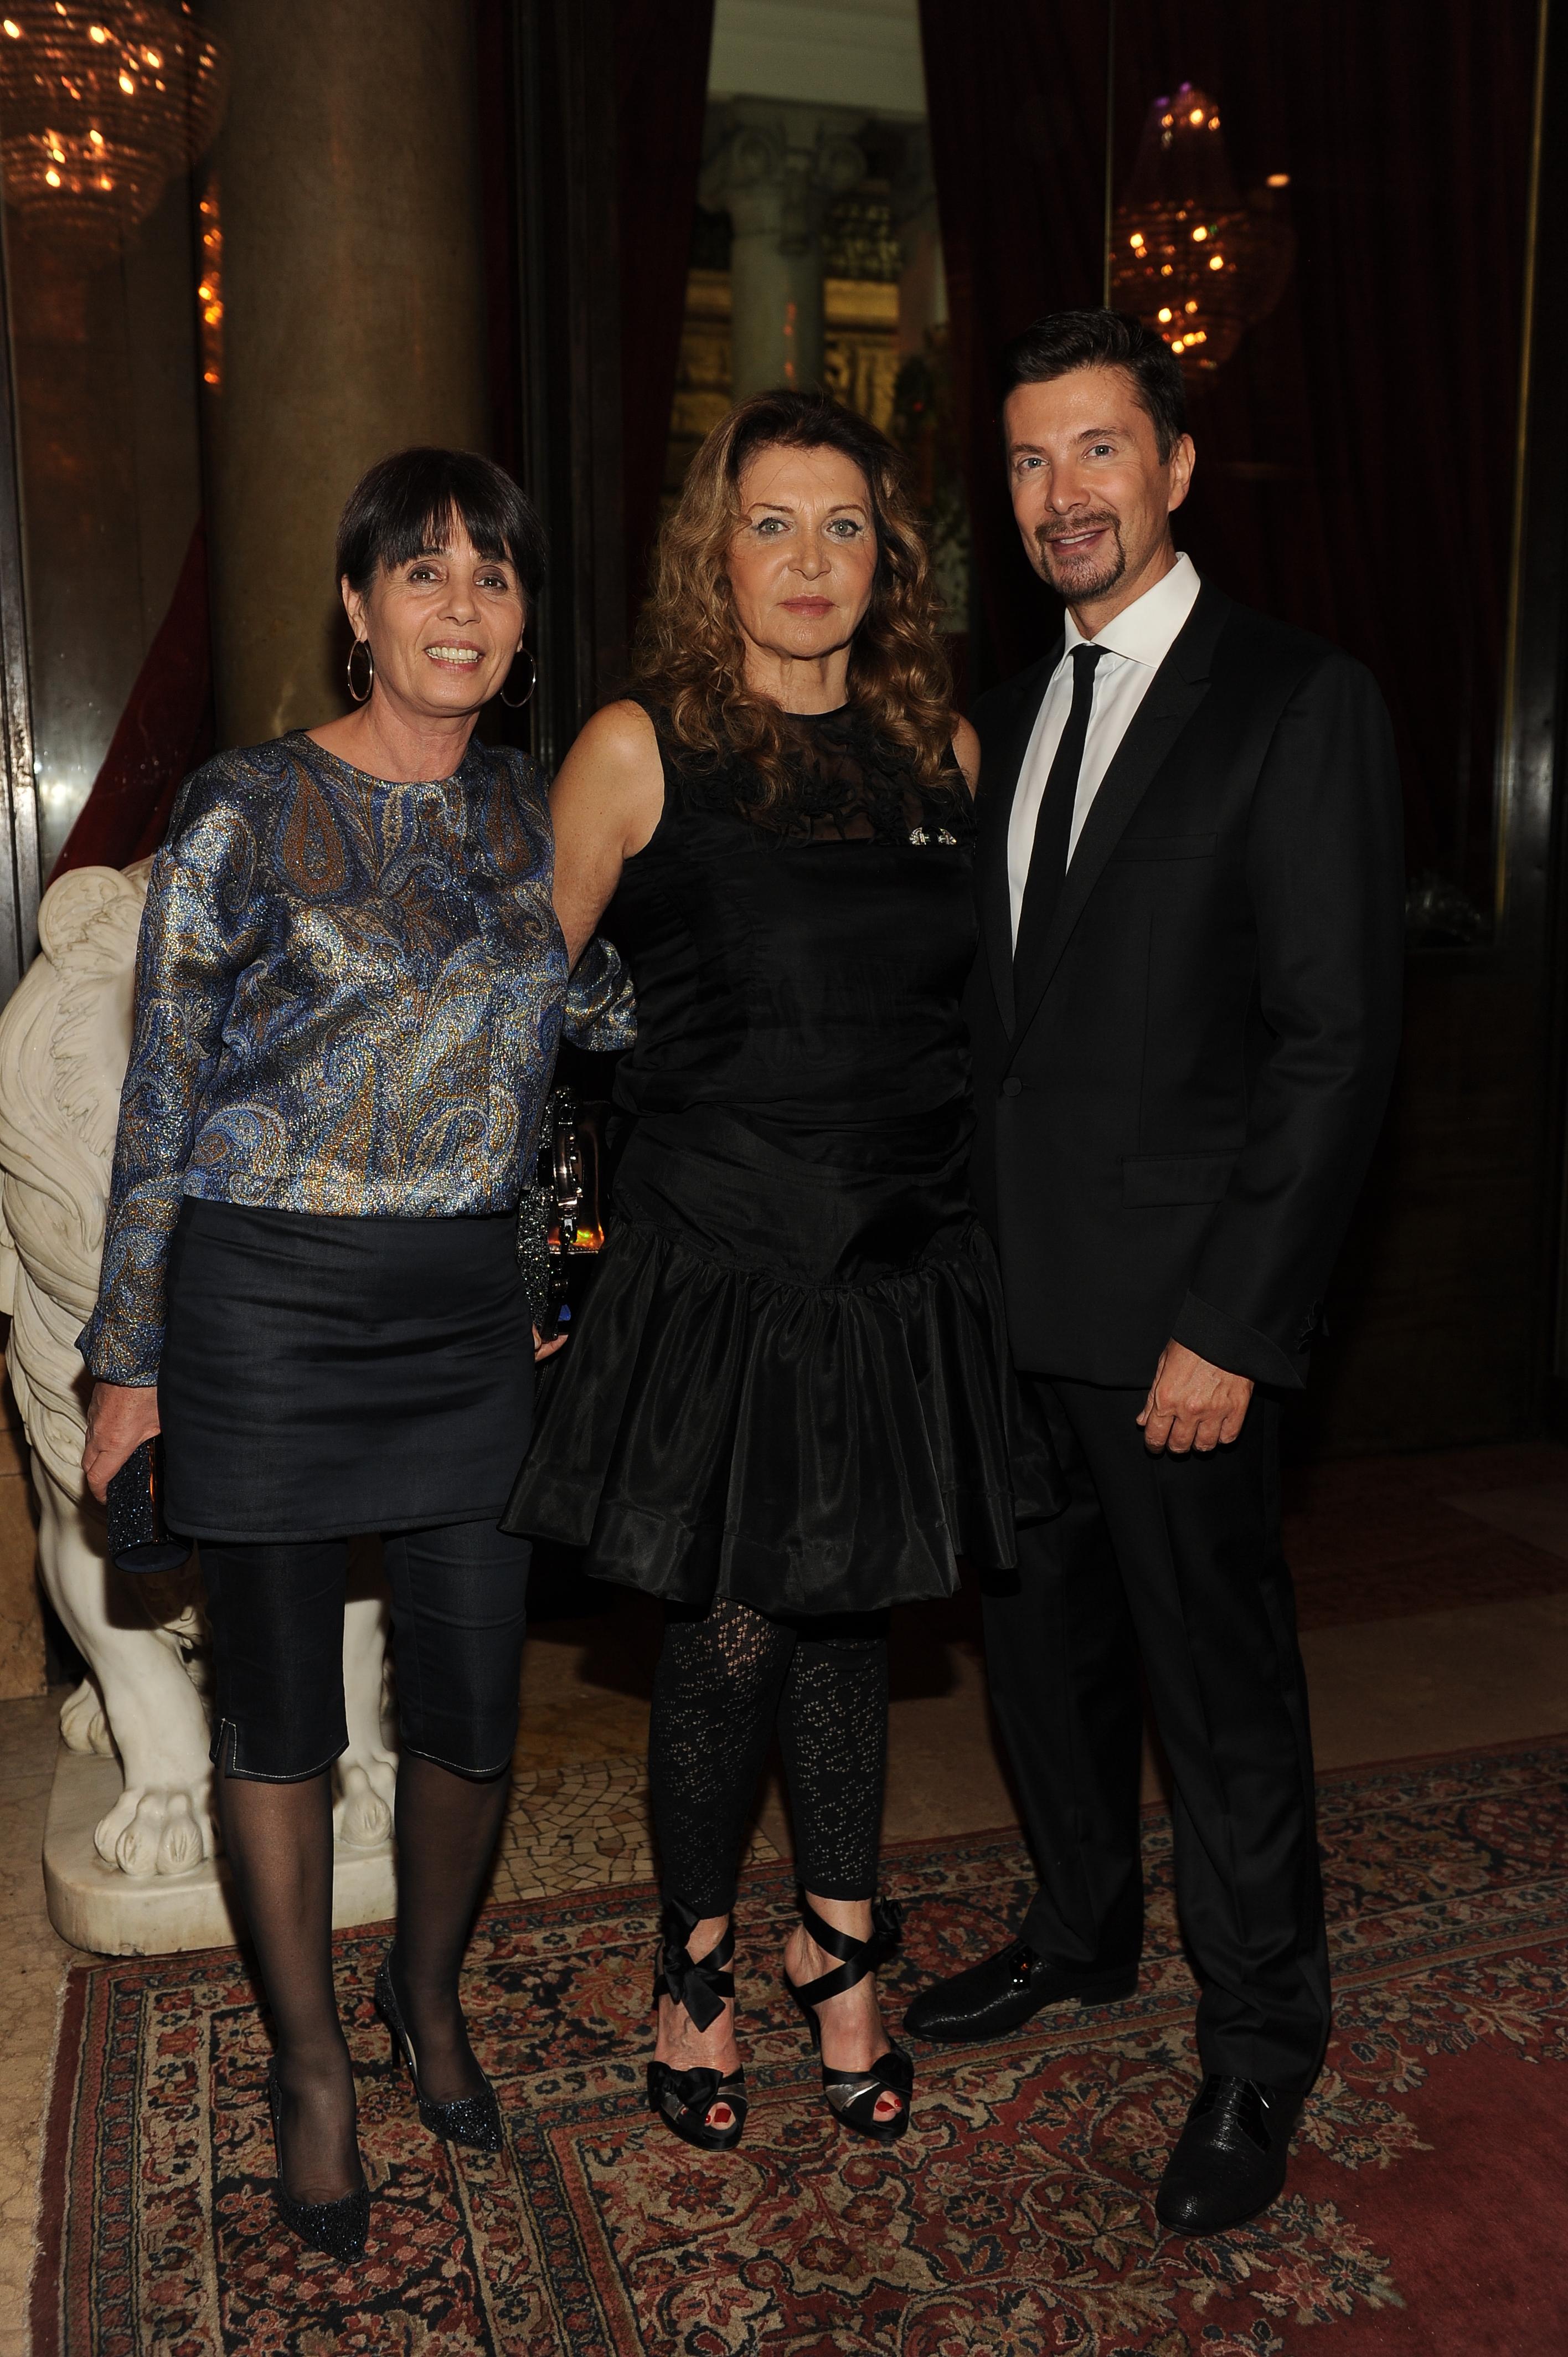 Sandra Vezza;Maria Luisa Trussardi;Riccardo Signoretti